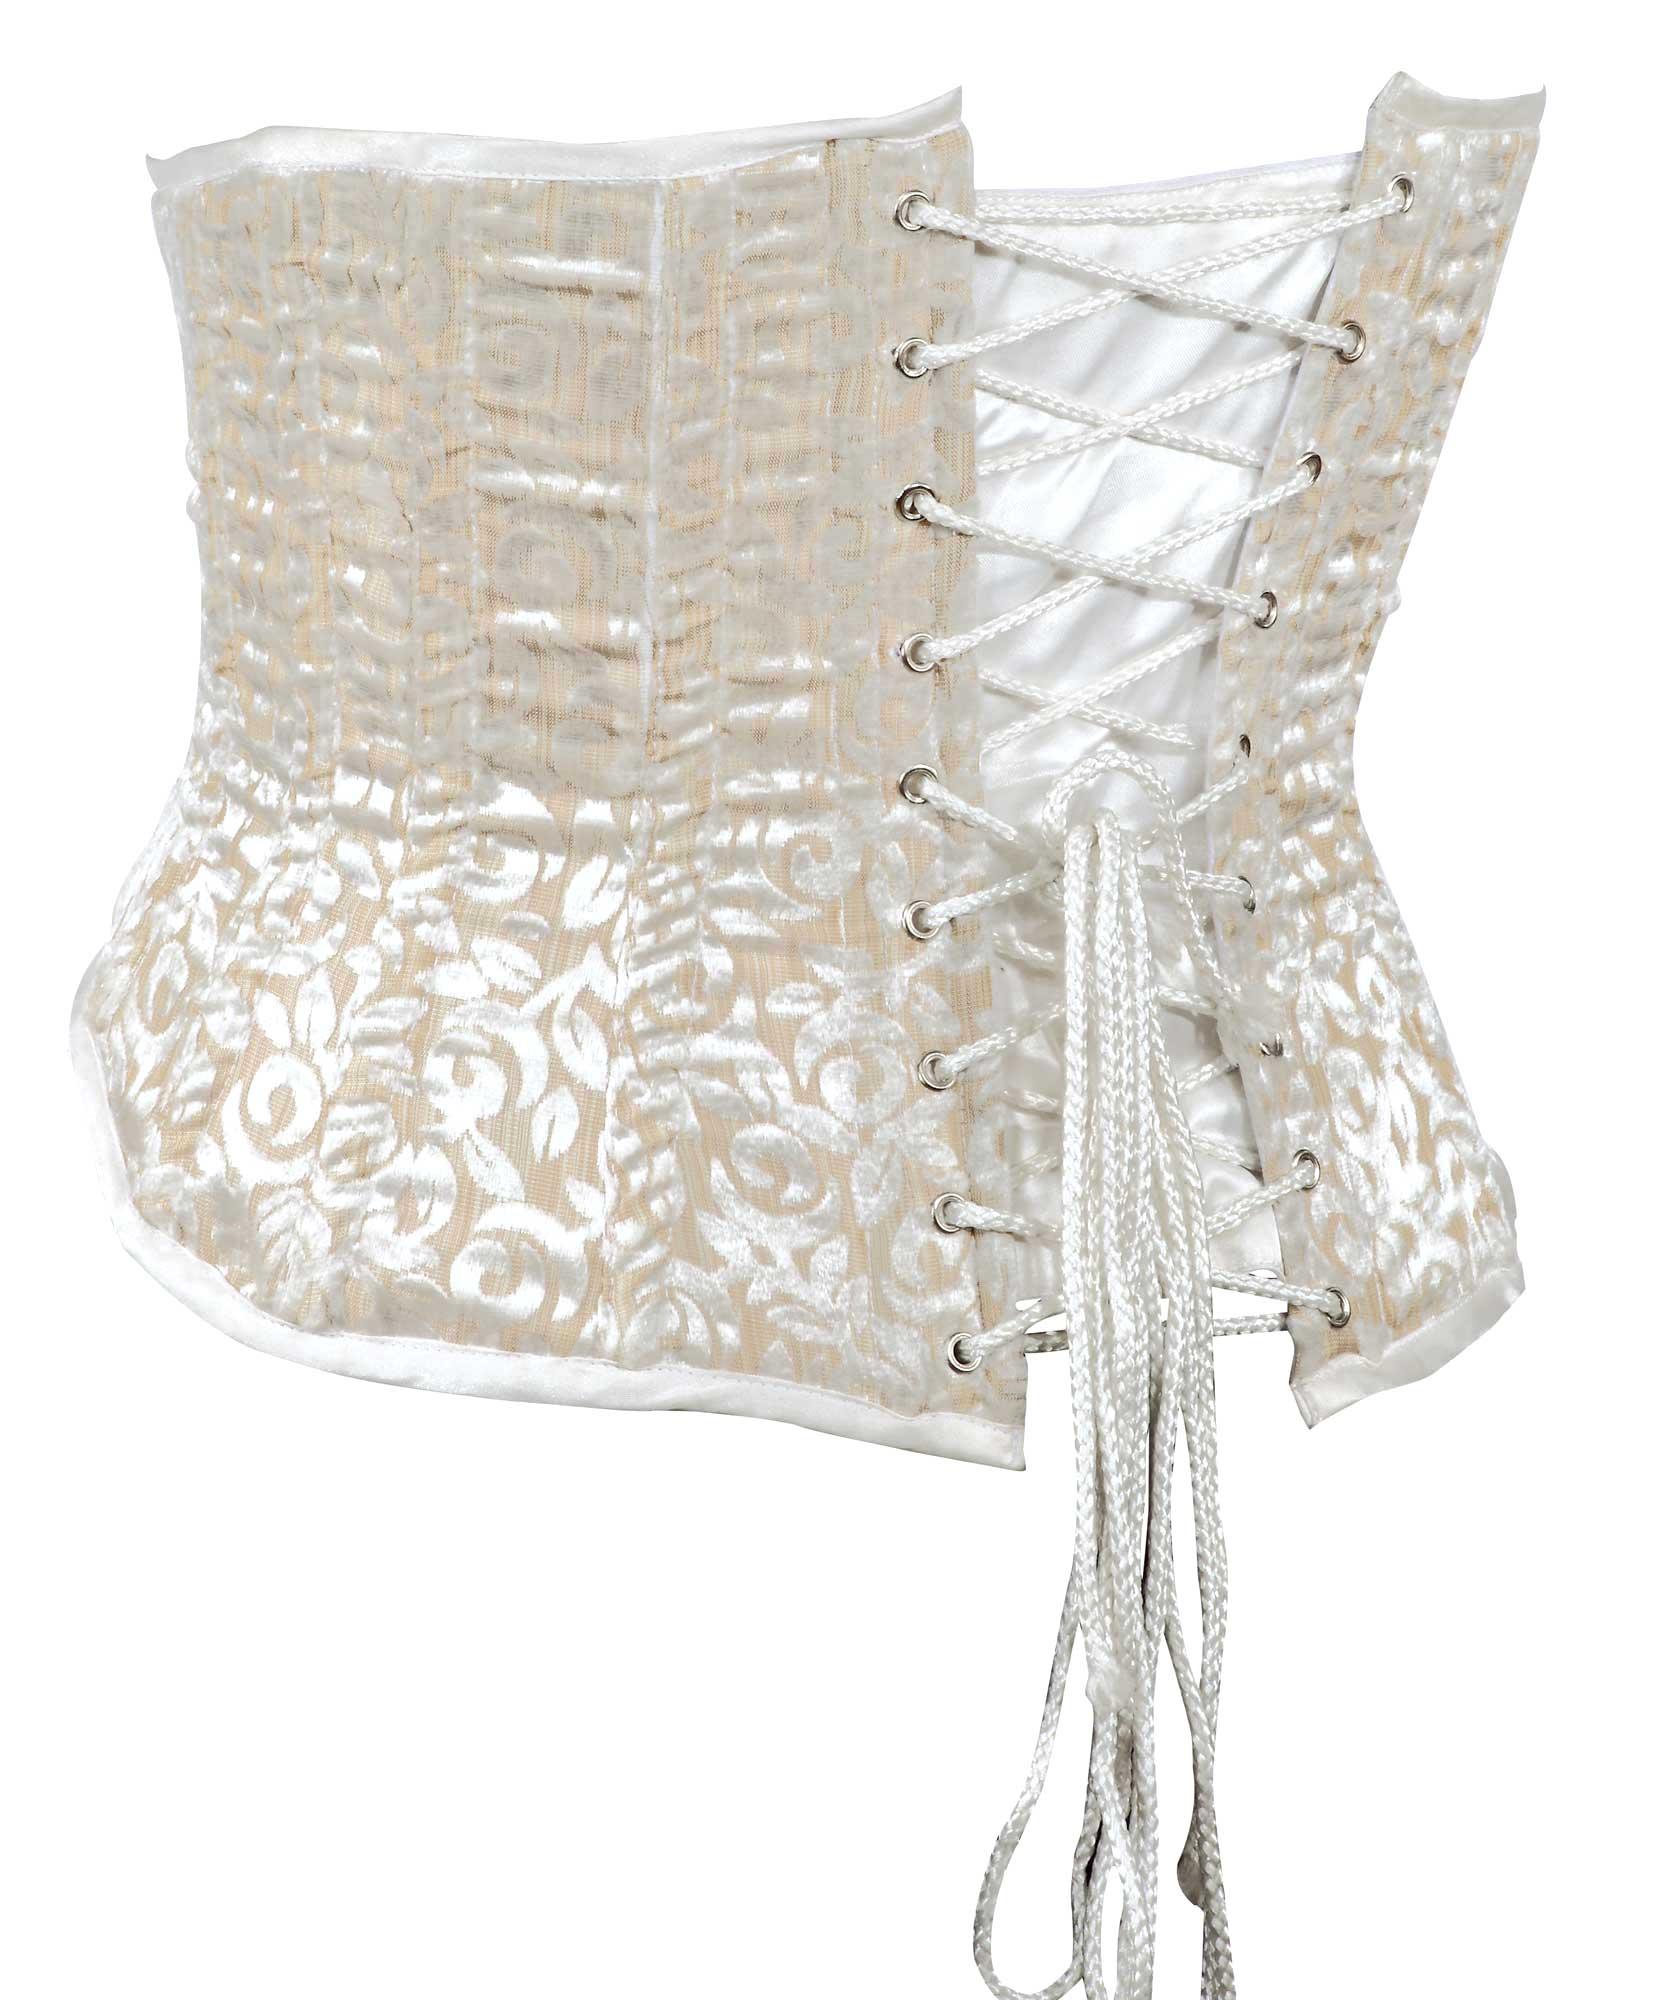 silver_floral_brasso_velvet_fabric_steel_boning_underbust_corset_waist_cincher_bustier_bustiers_and_corsets_3.jpg